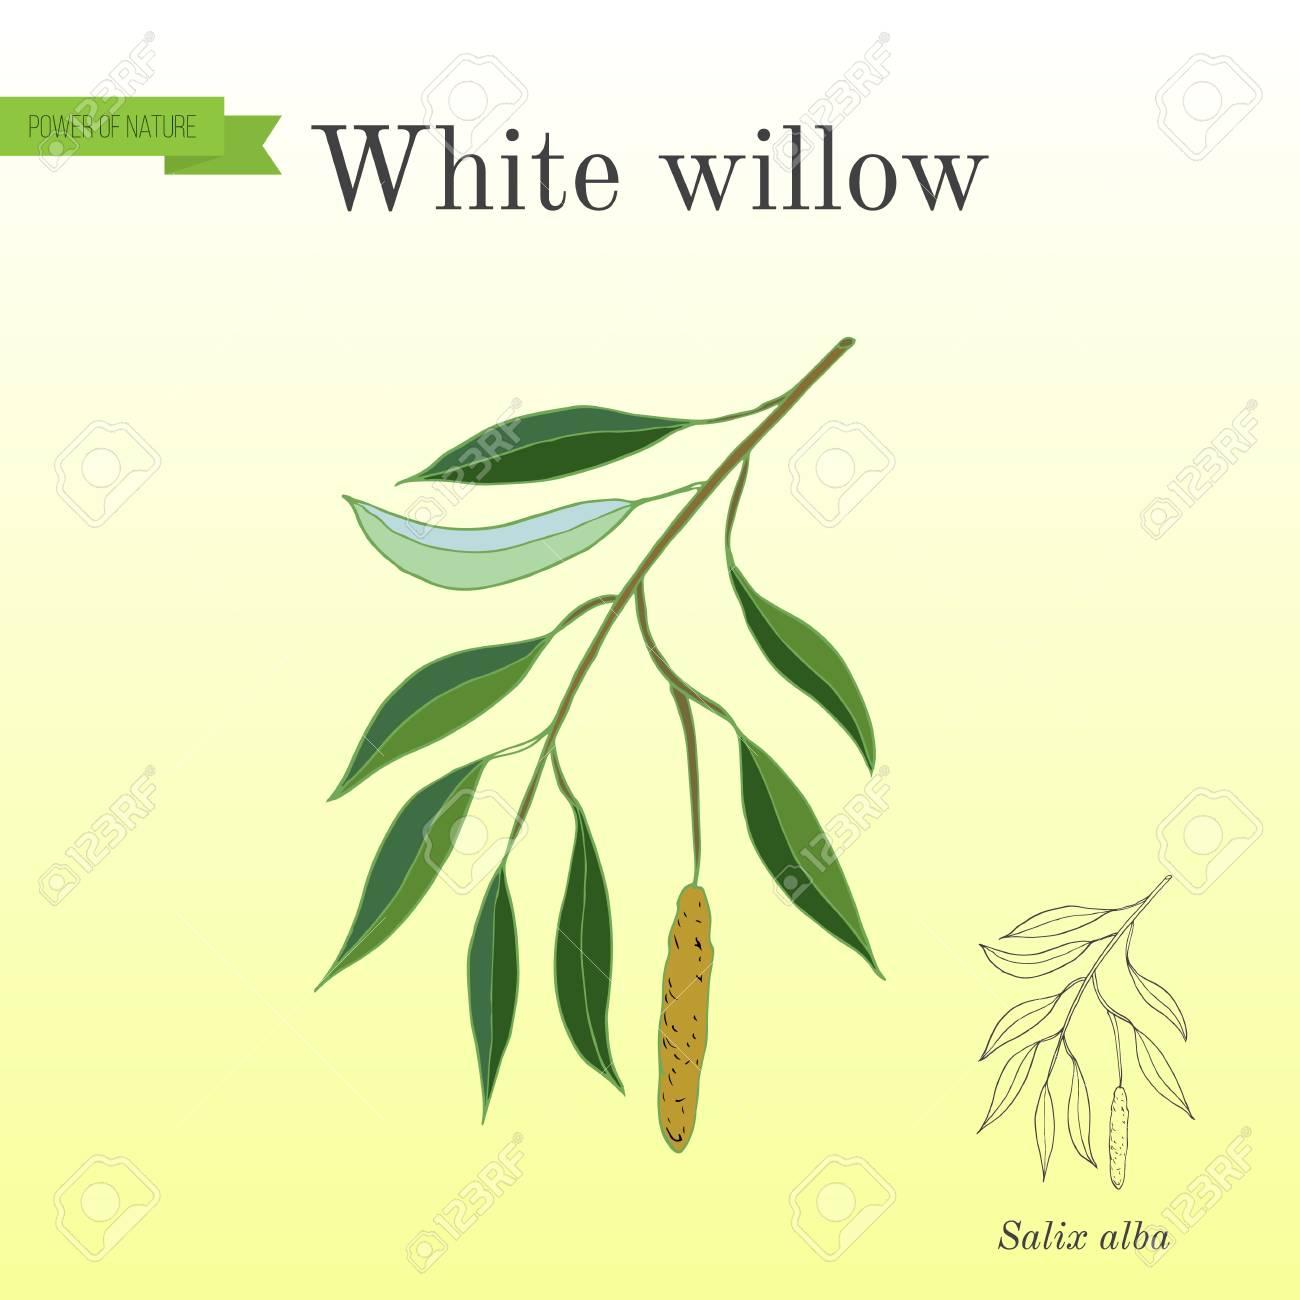 White willow branch salix alba  Hand drawn botanical vector illustration